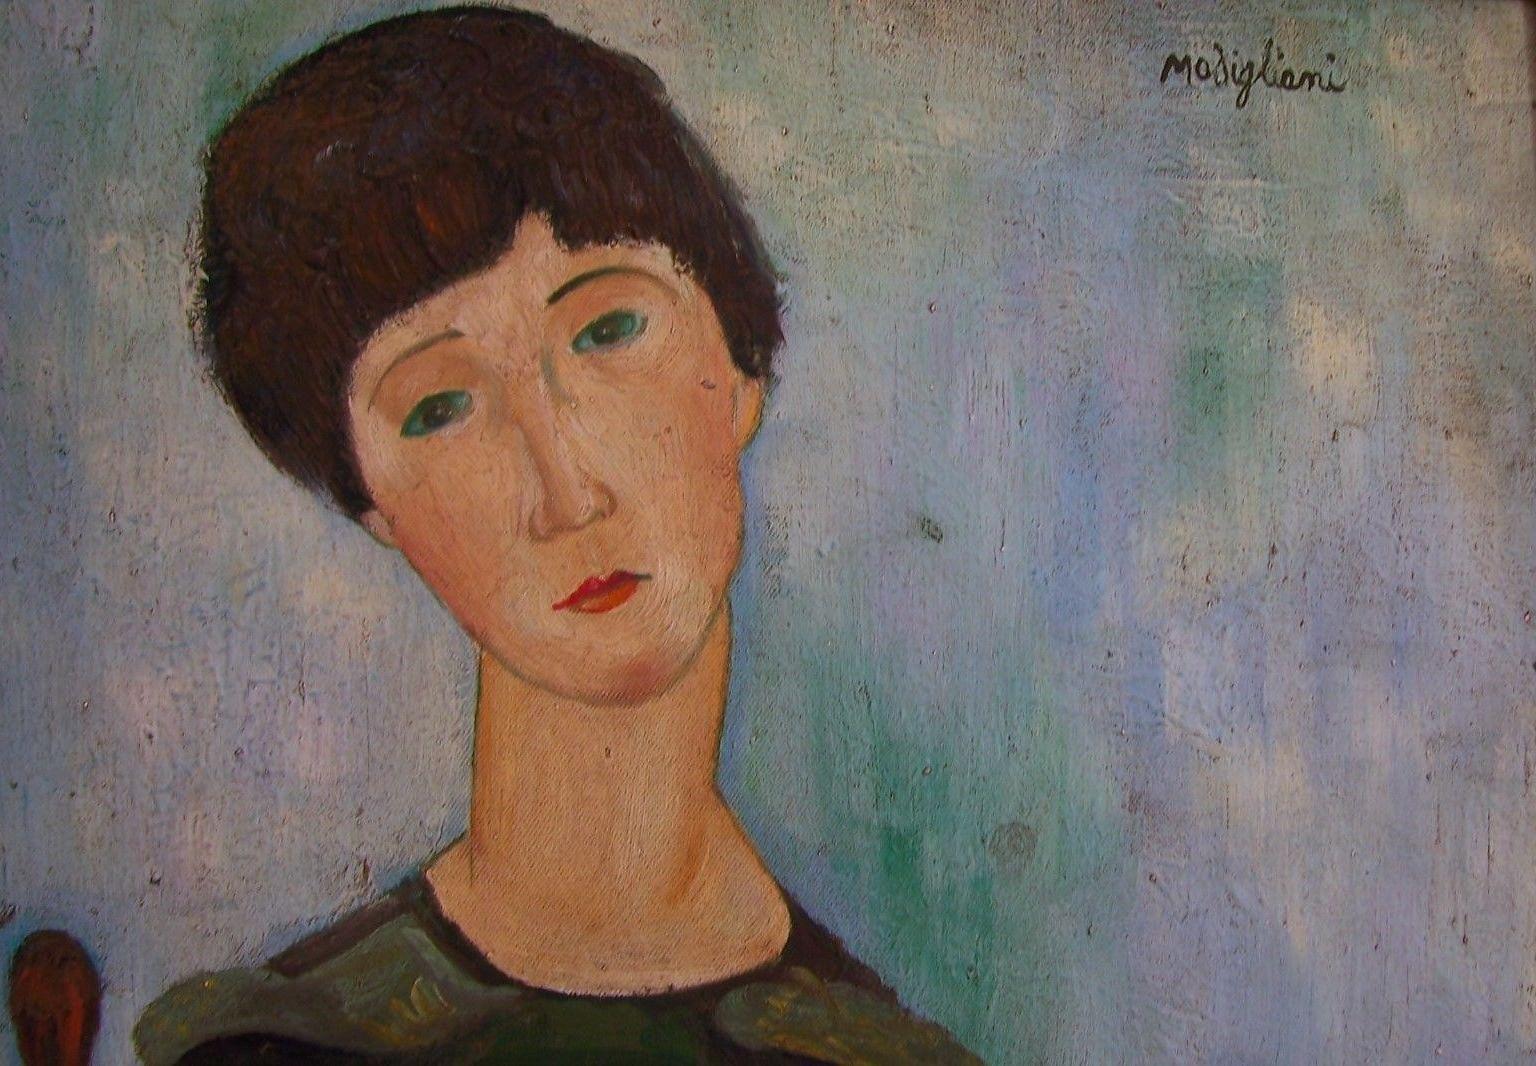 Amedeo Modigliani: Expressionist / Modern Painter